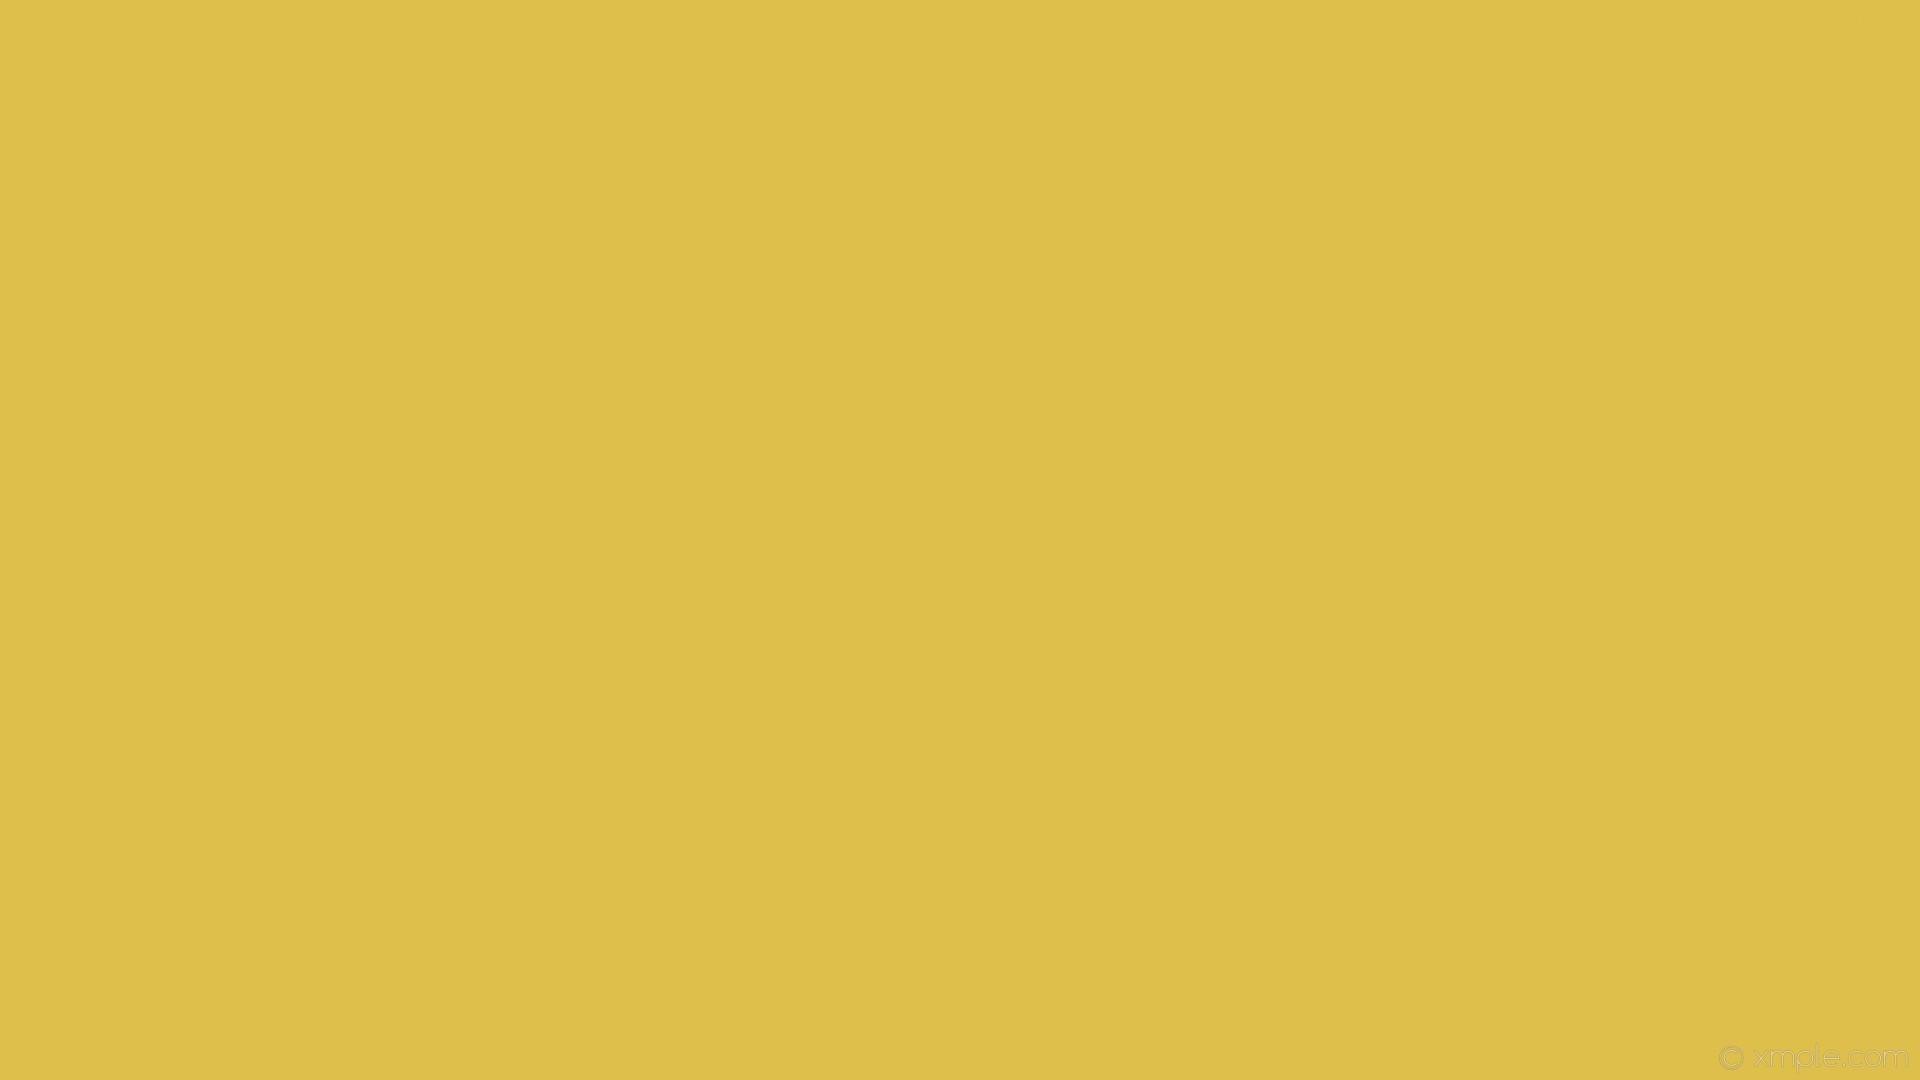 wallpaper one colour yellow single plain solid color #dfbf4c